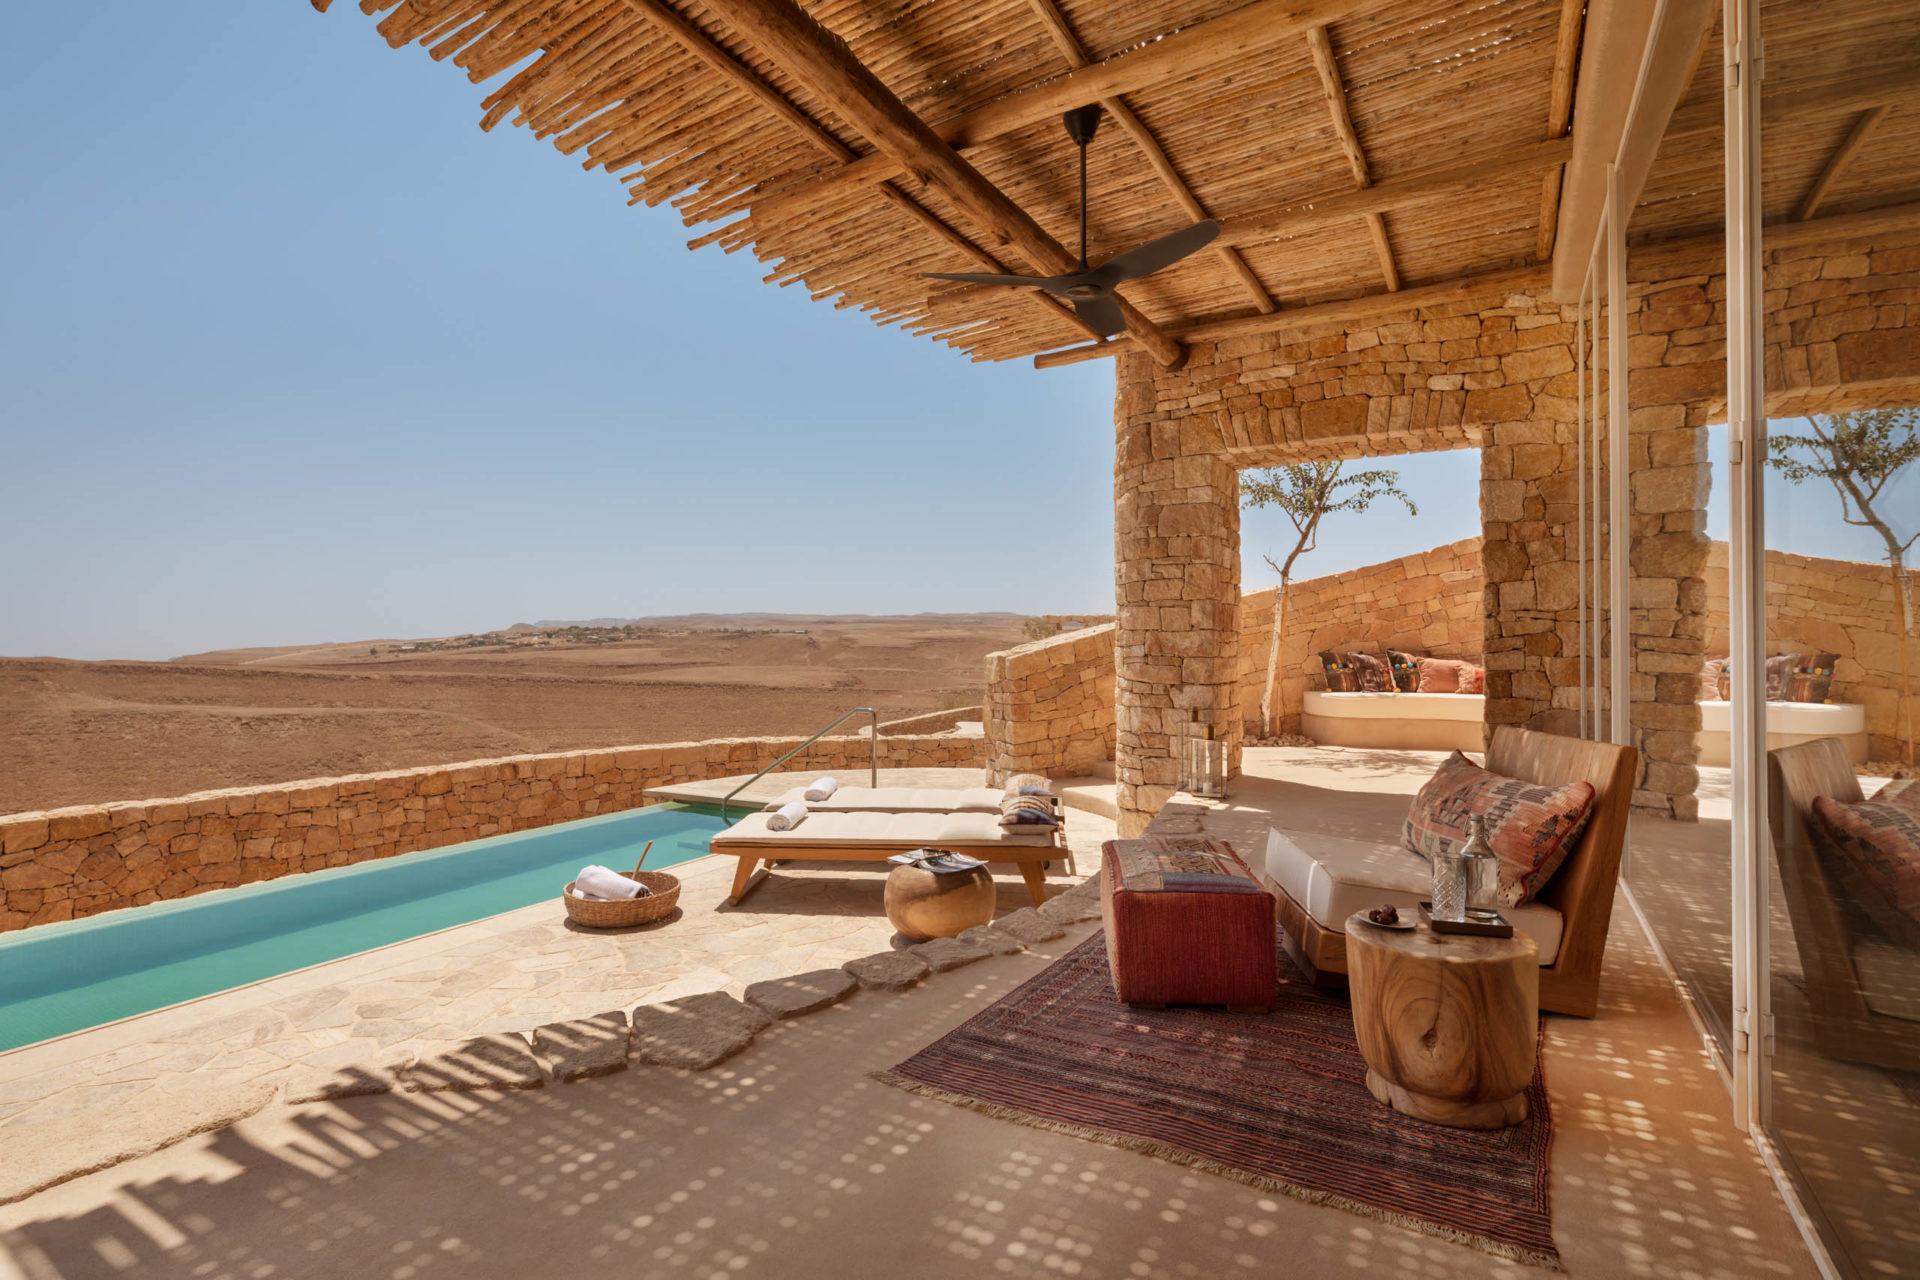 shaharut-israelpanorama-pool-villa-outdoor-terrace2